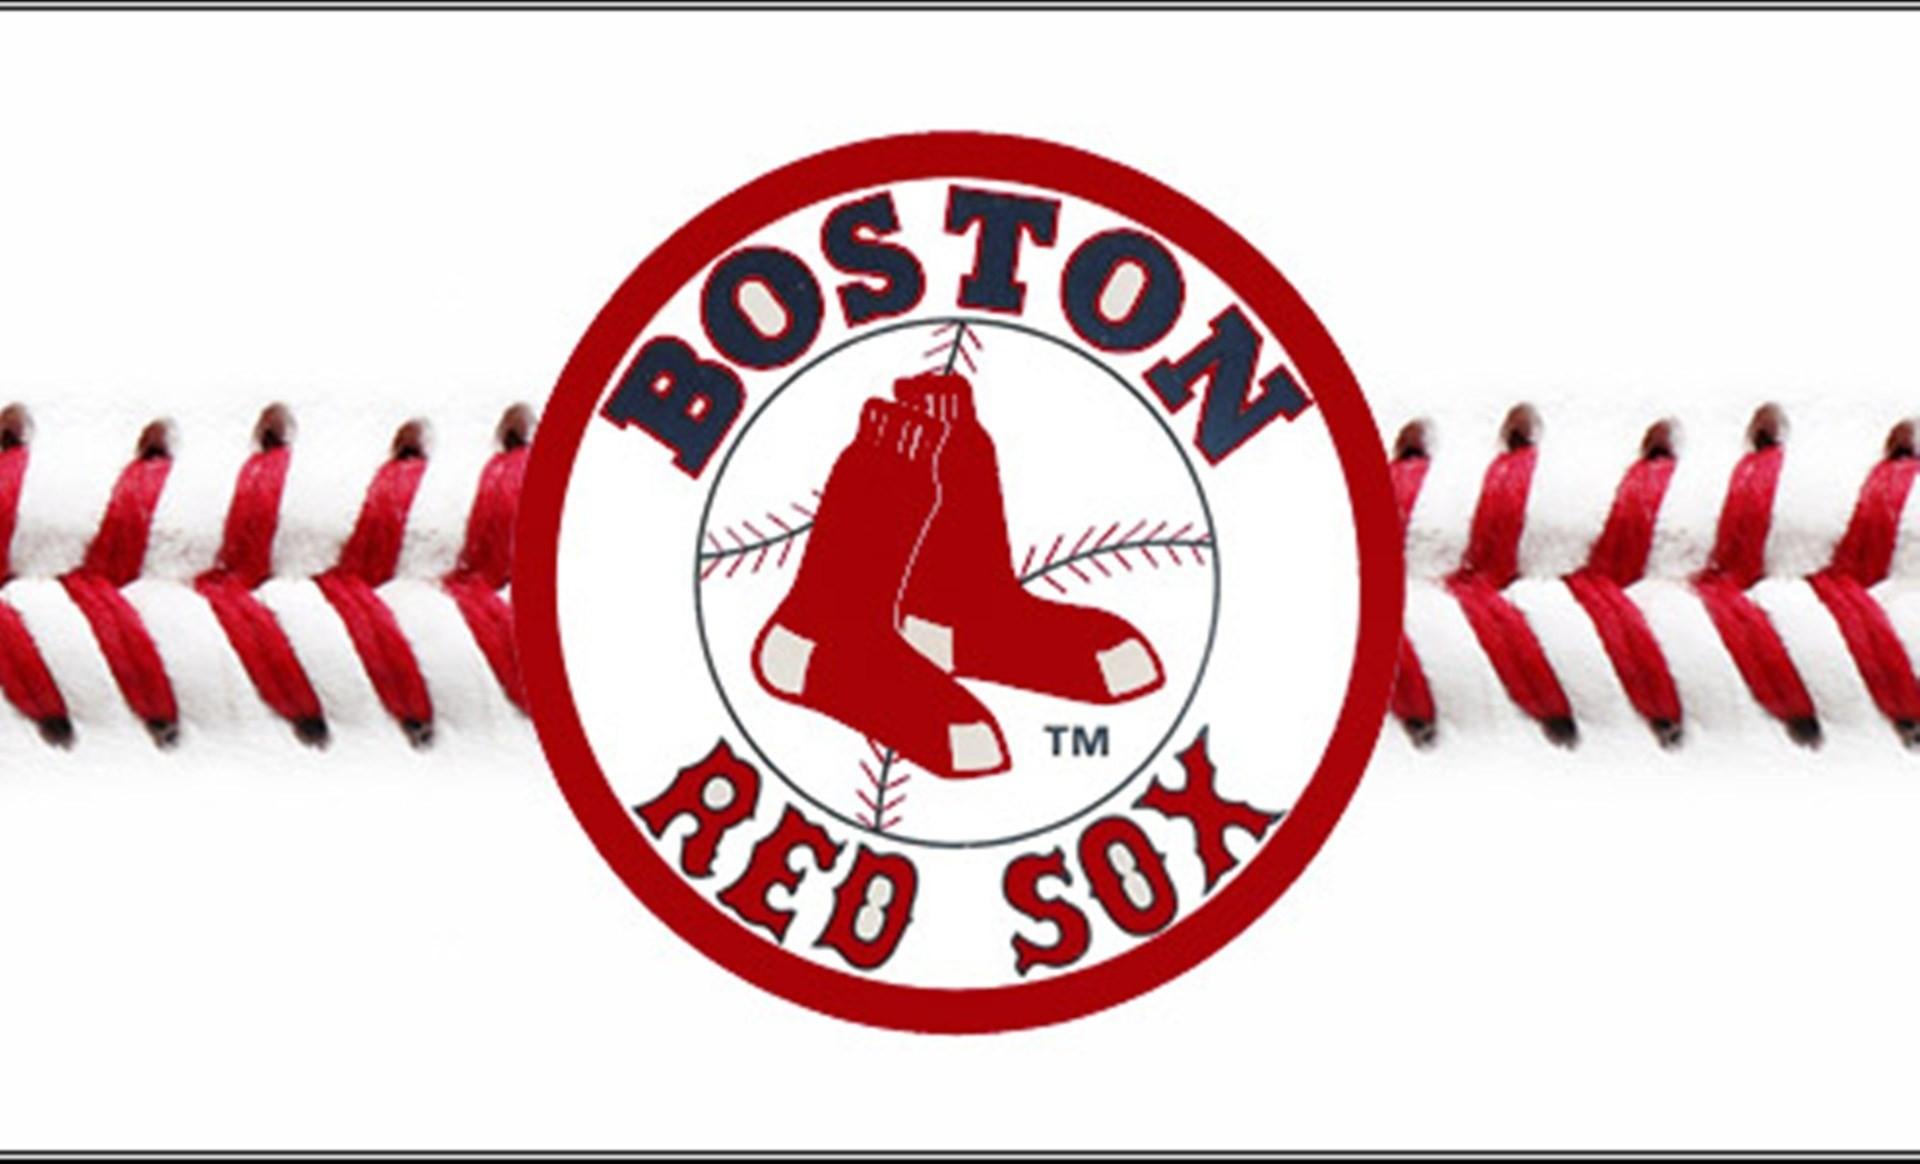 boston red sox logo trans